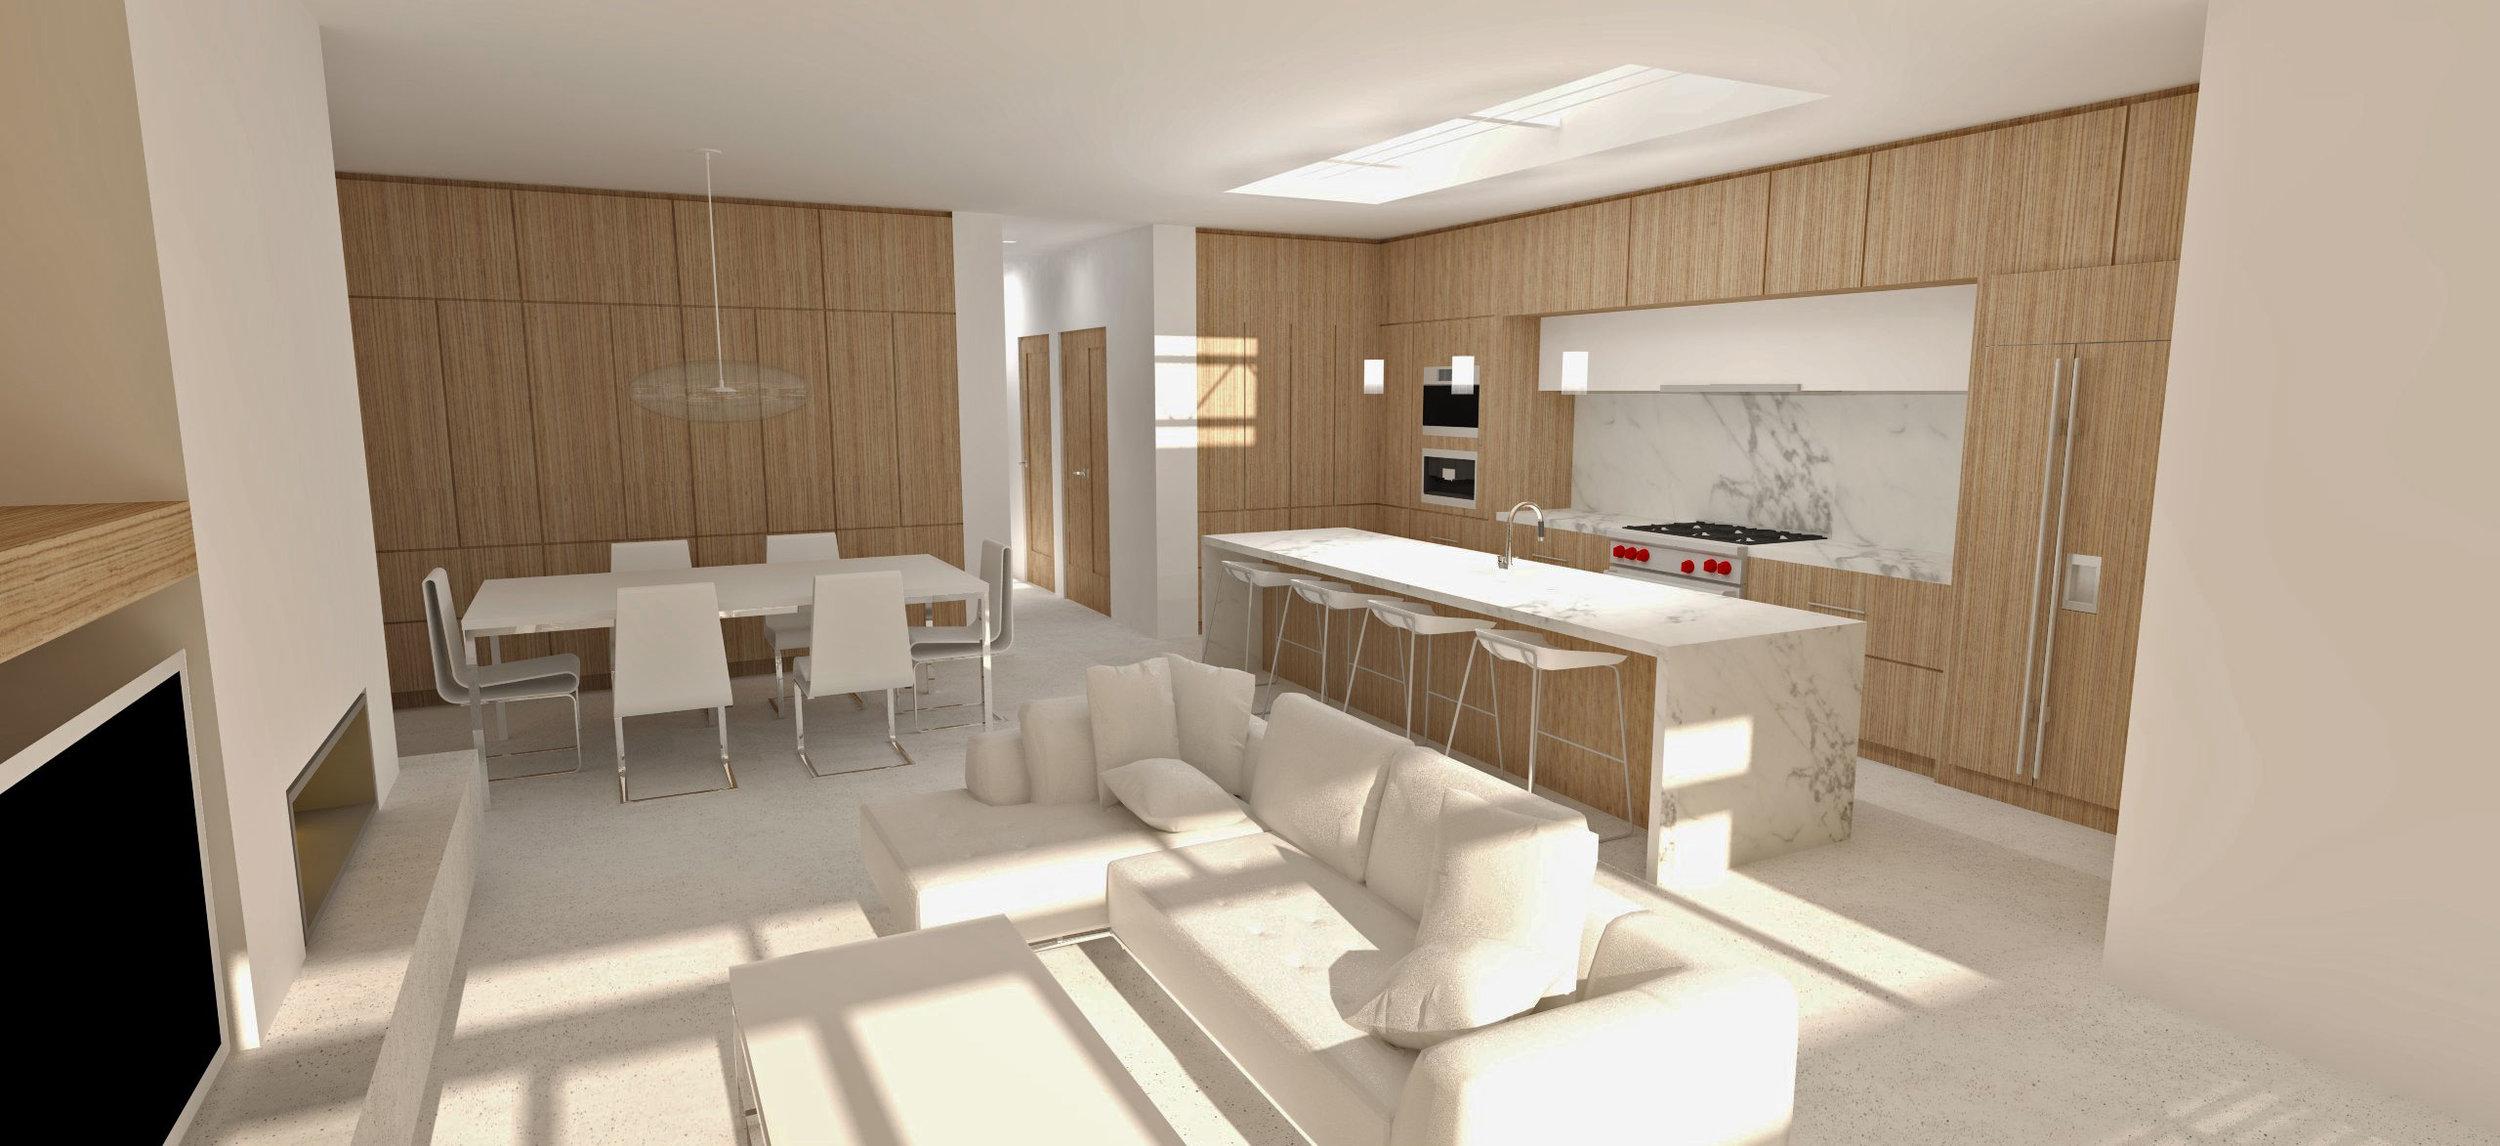 2016-11-07-main-dining-kitchen.jpg